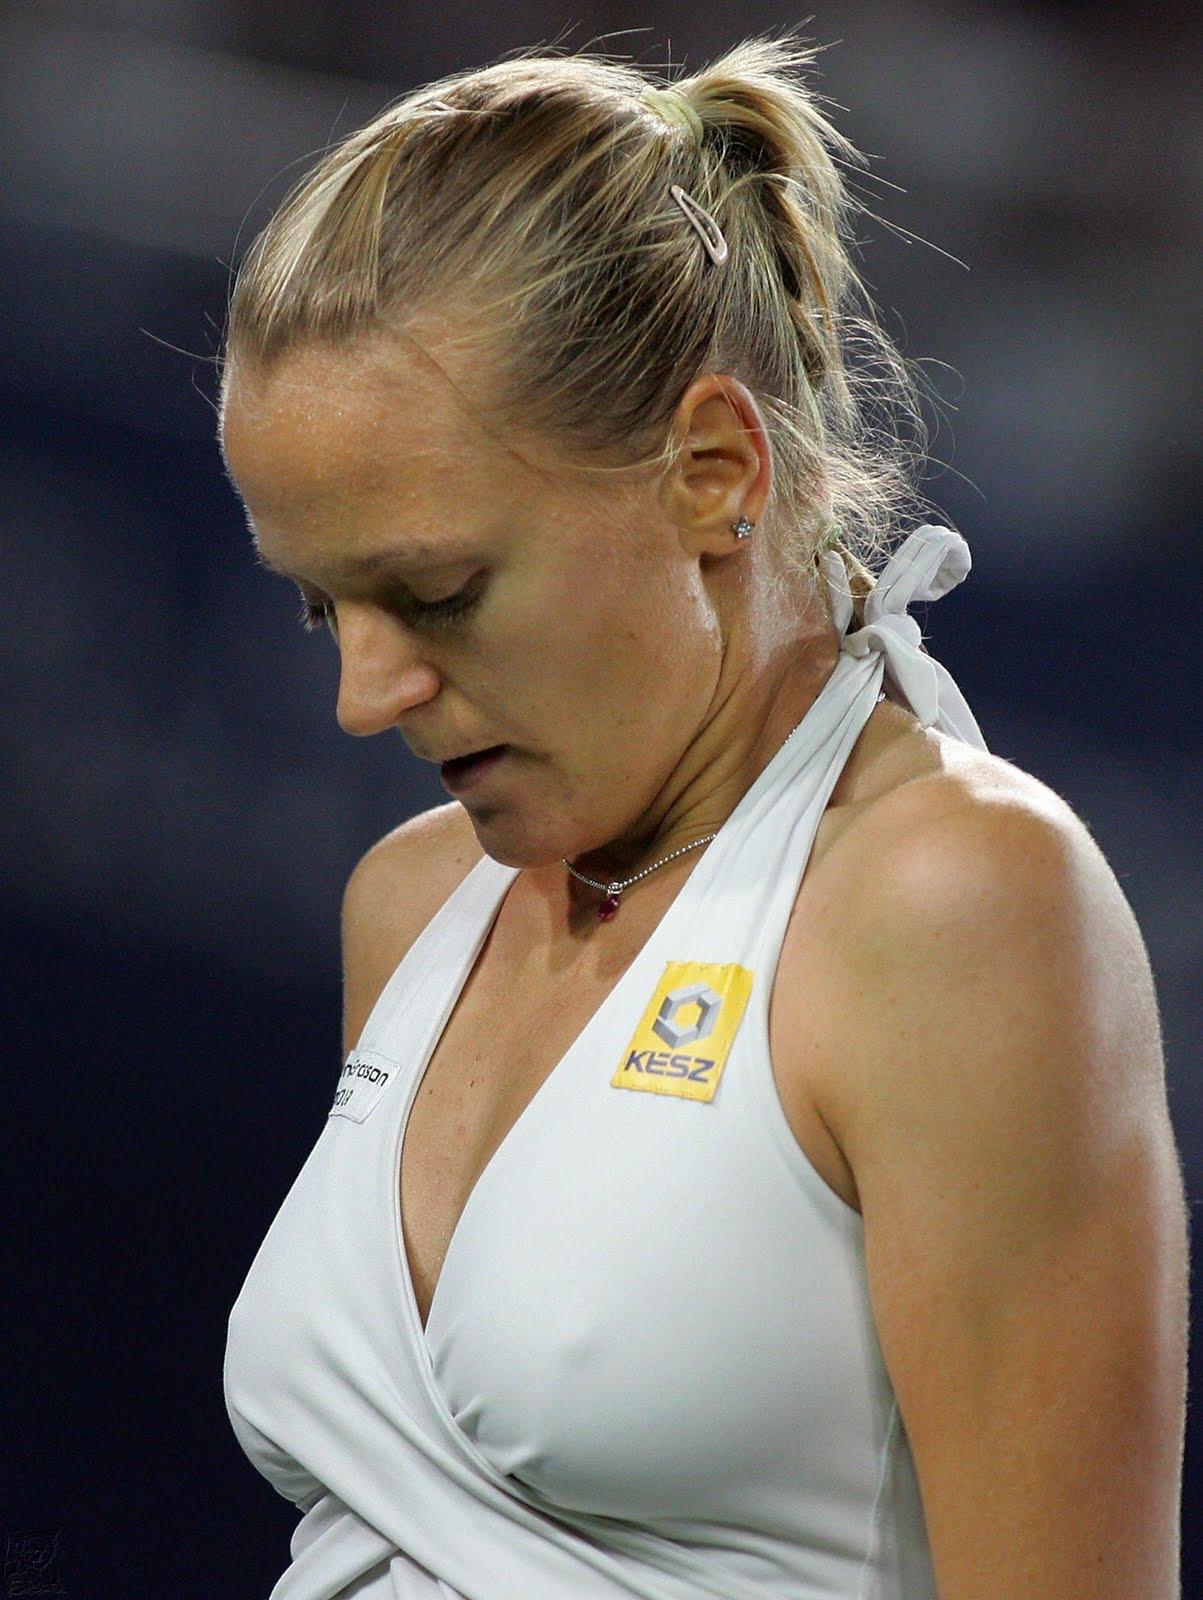 Opinion agnes szavay tennis player something